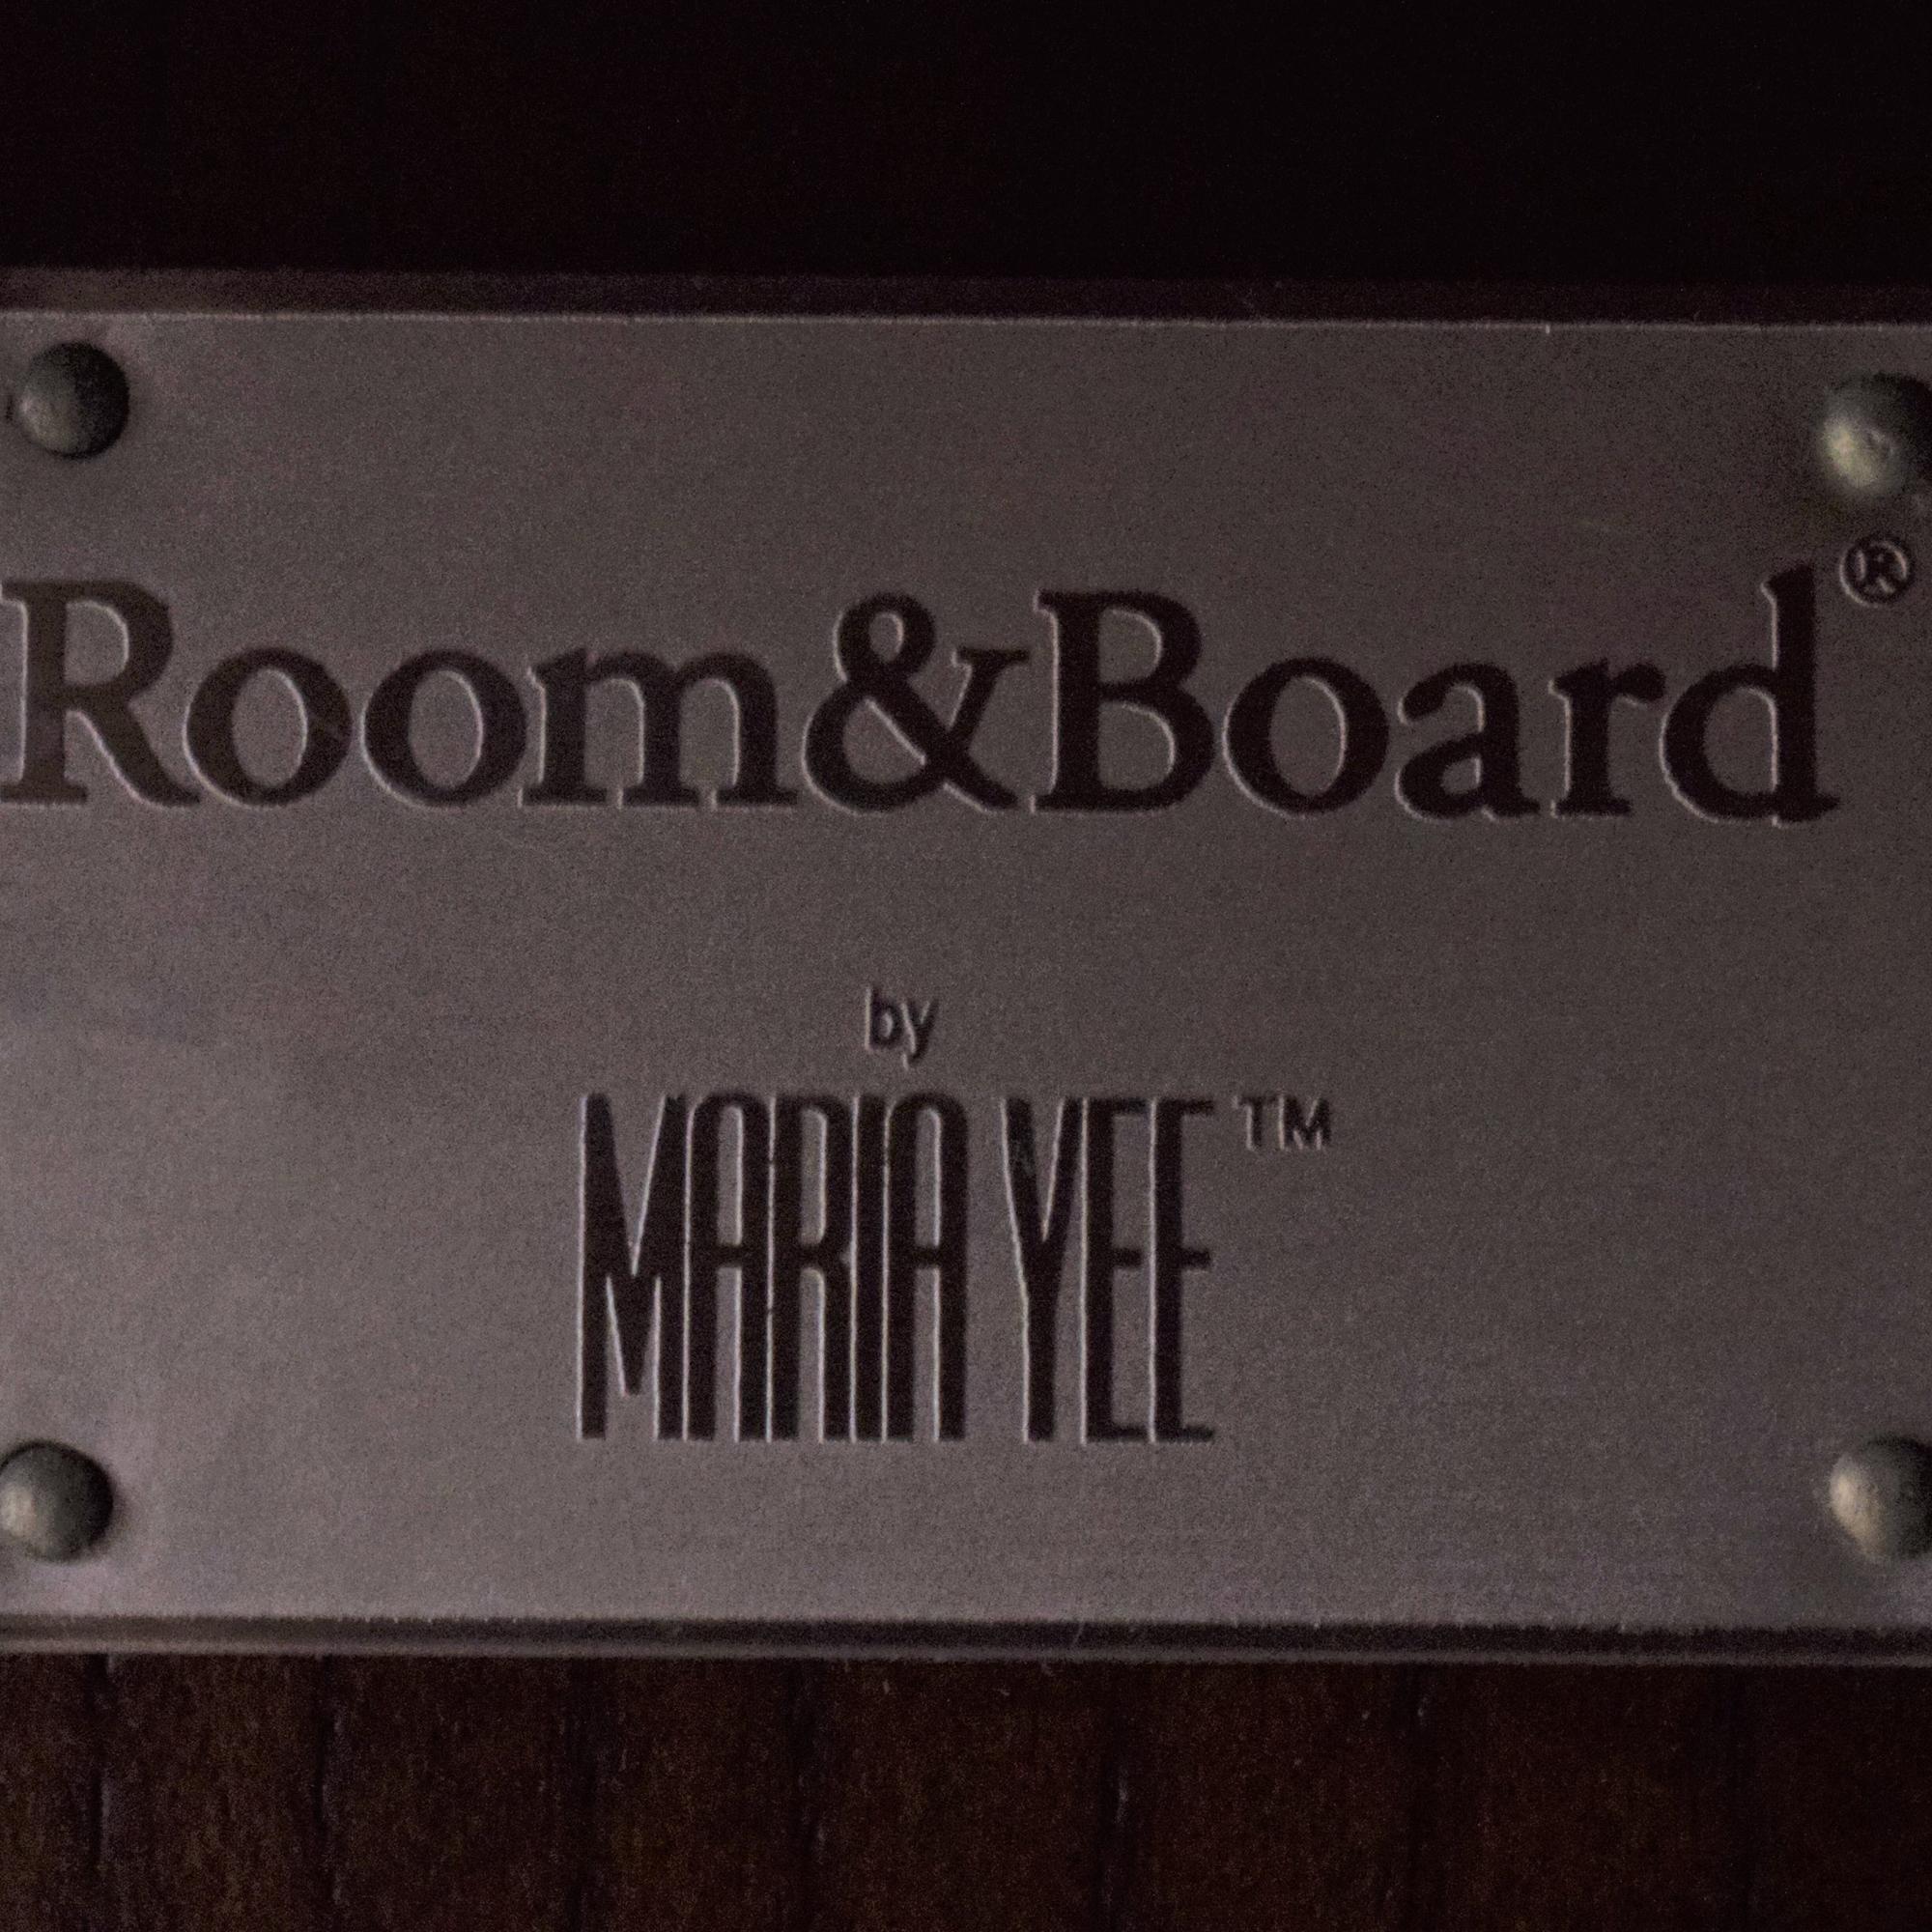 Room & Board Room & Board Maria Yee Media Unit dark brown